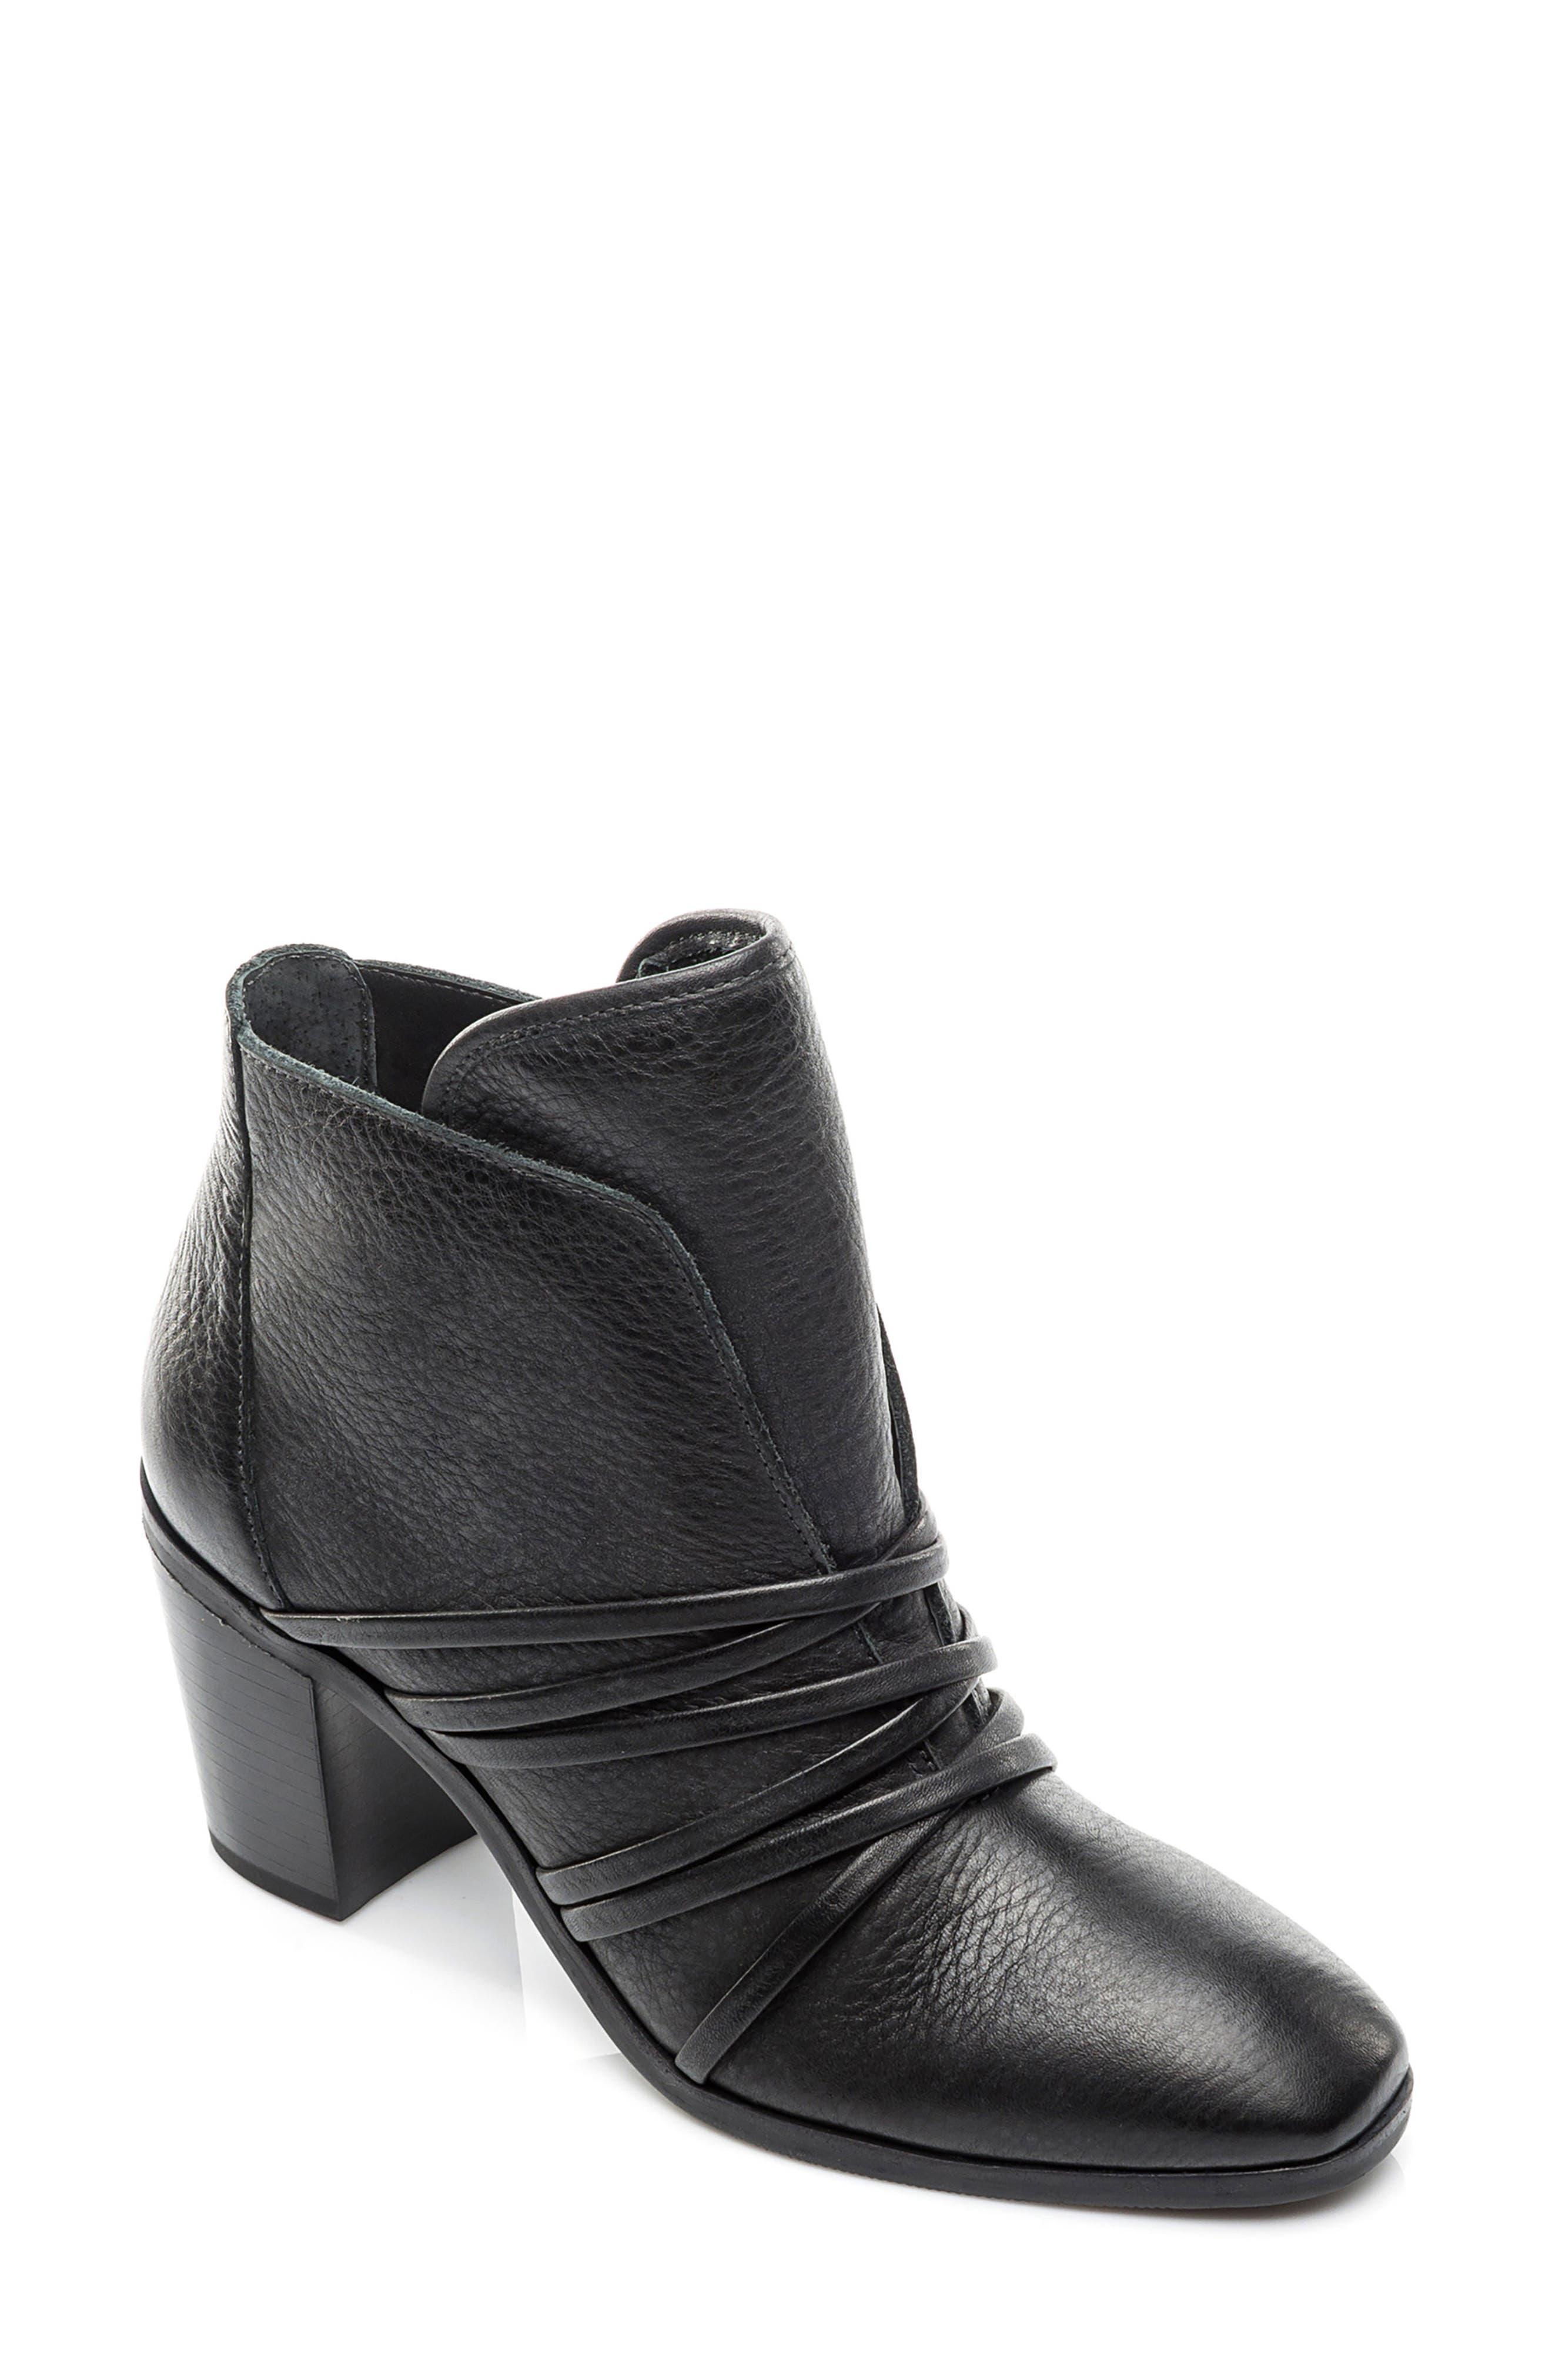 Bernardo Felicity Bootie,                         Main,                         color, Black Pebble Leather